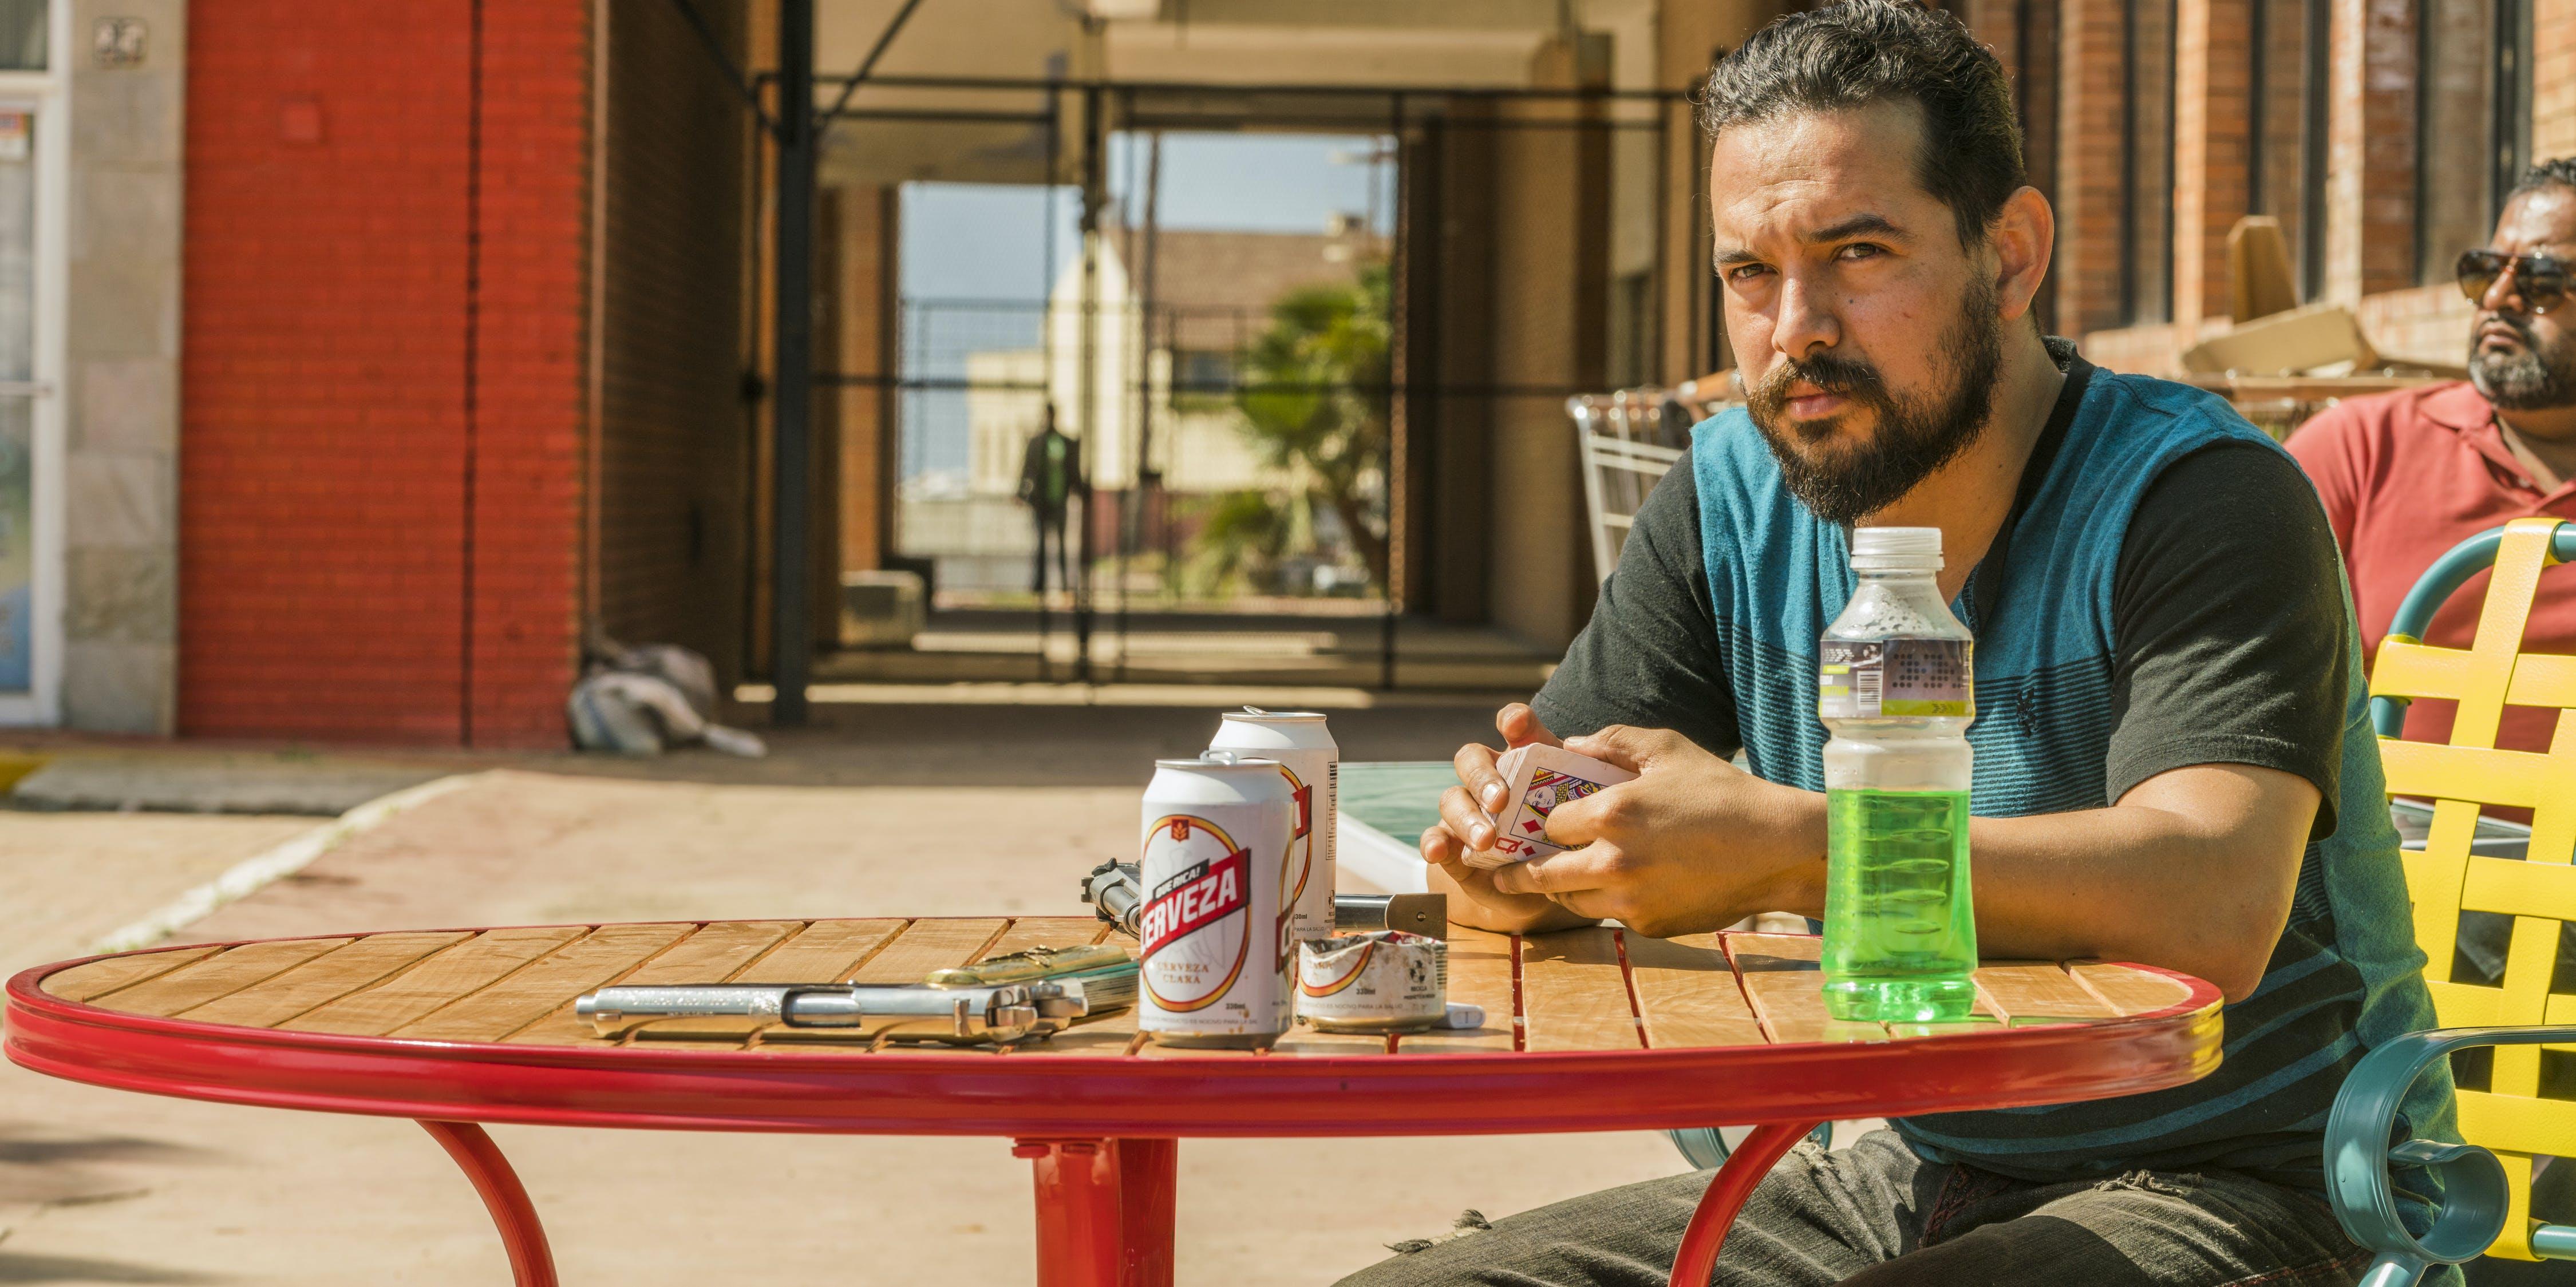 'Fear the Walking Dead' Explores A Cartel Supermarket